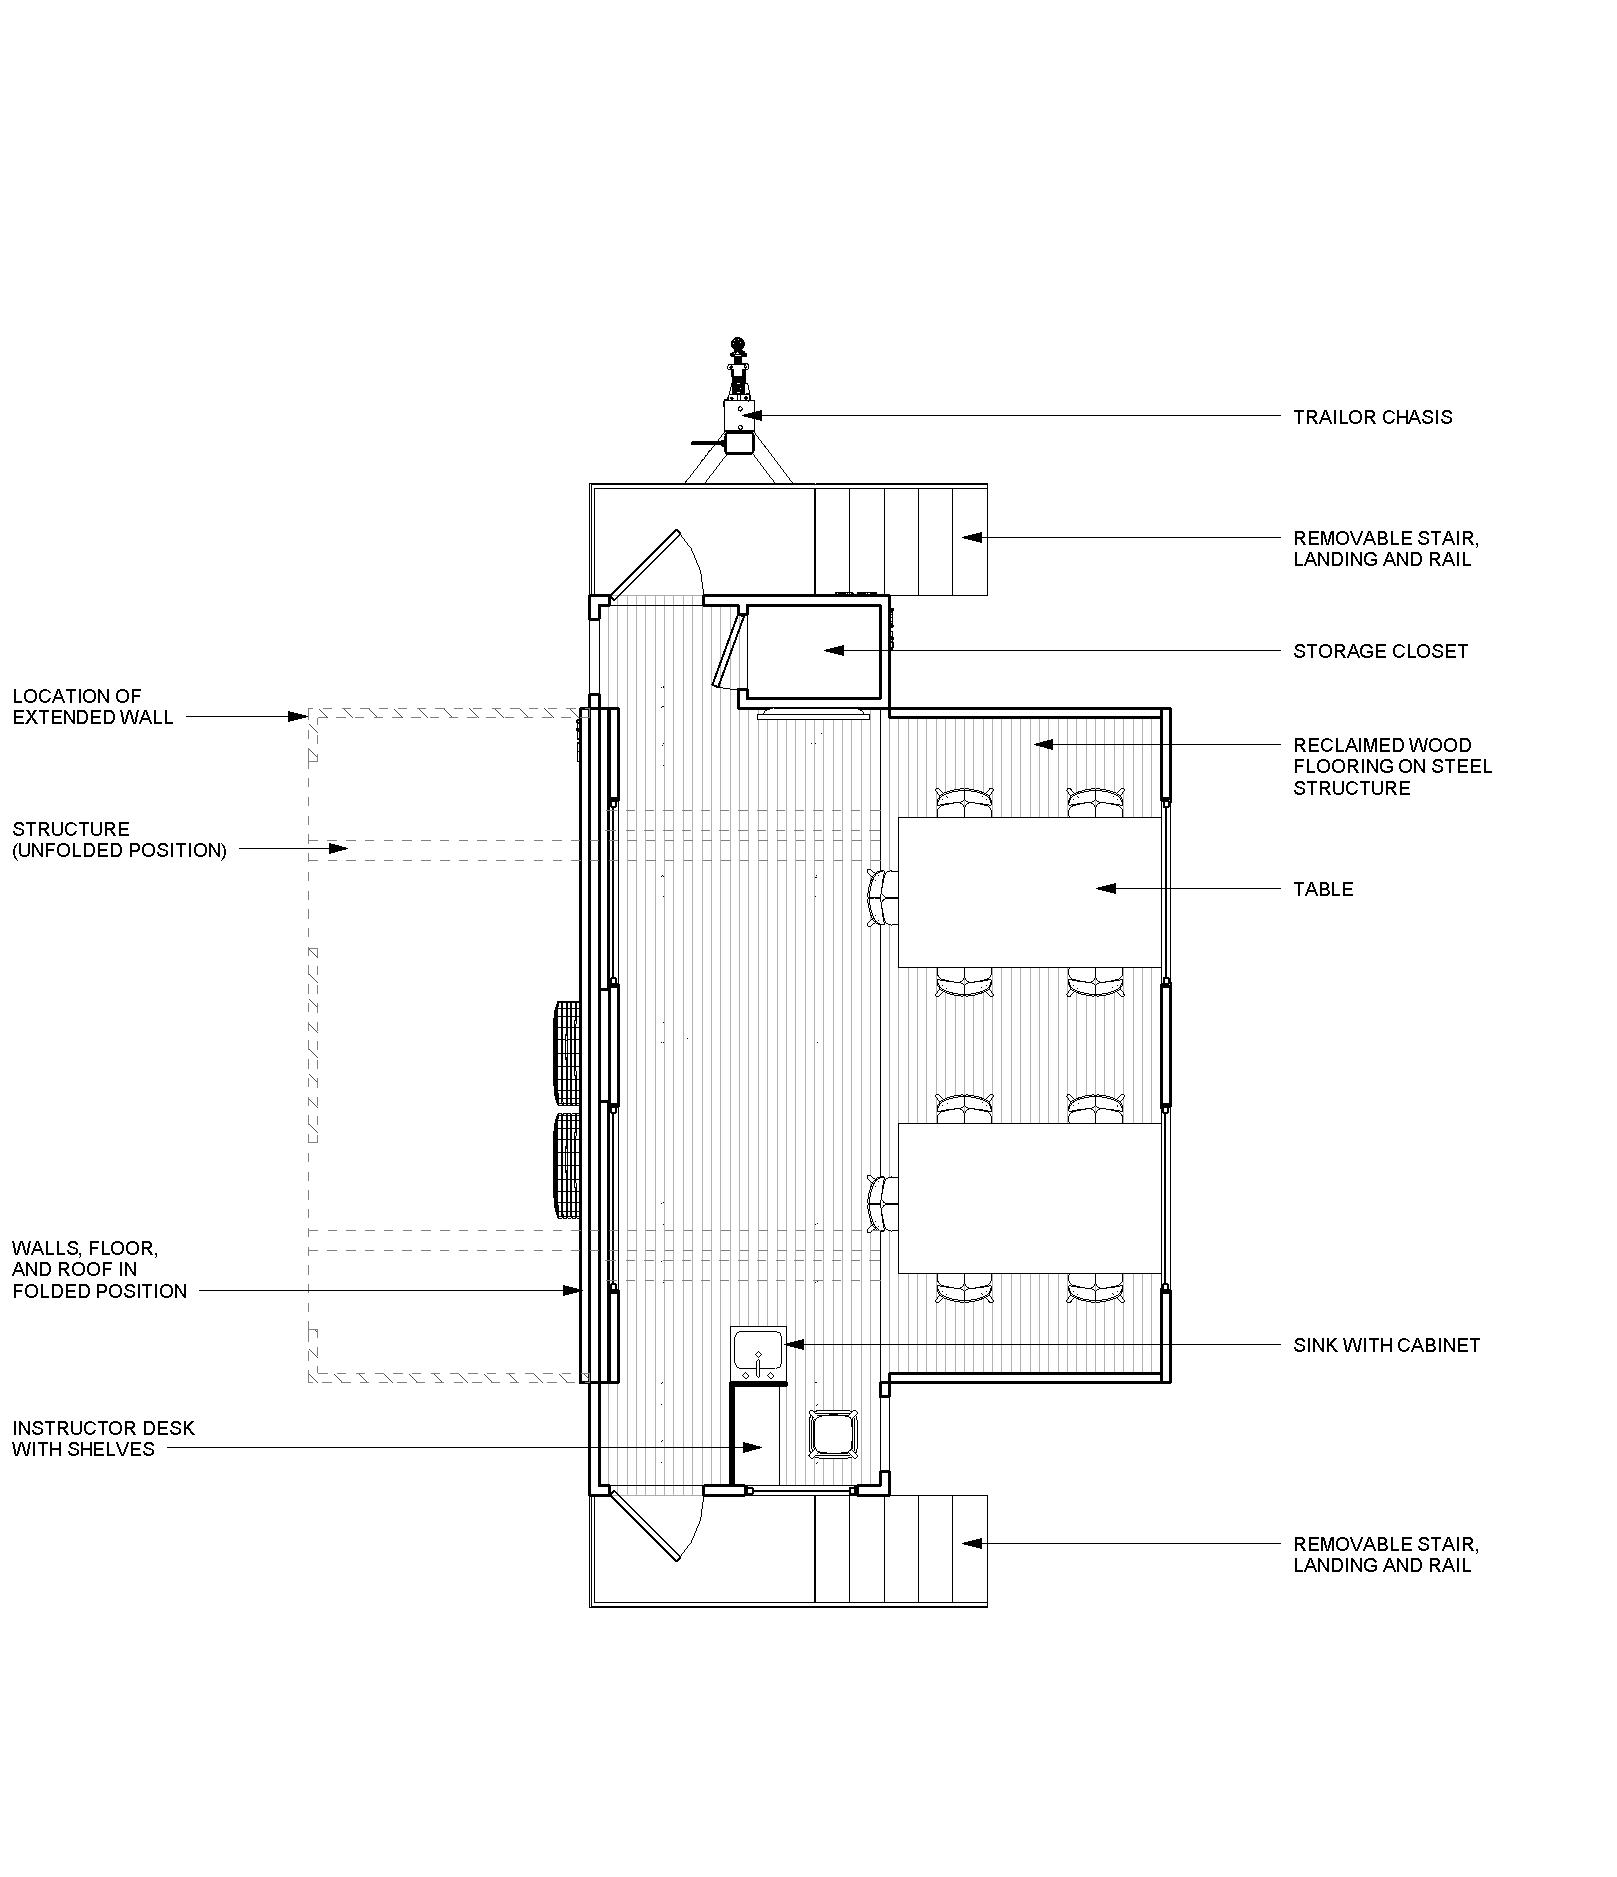 14_028_Mobile Classroom - Floor Plan - FIRST FLOOR PLAN - PRESENTATION.jpg